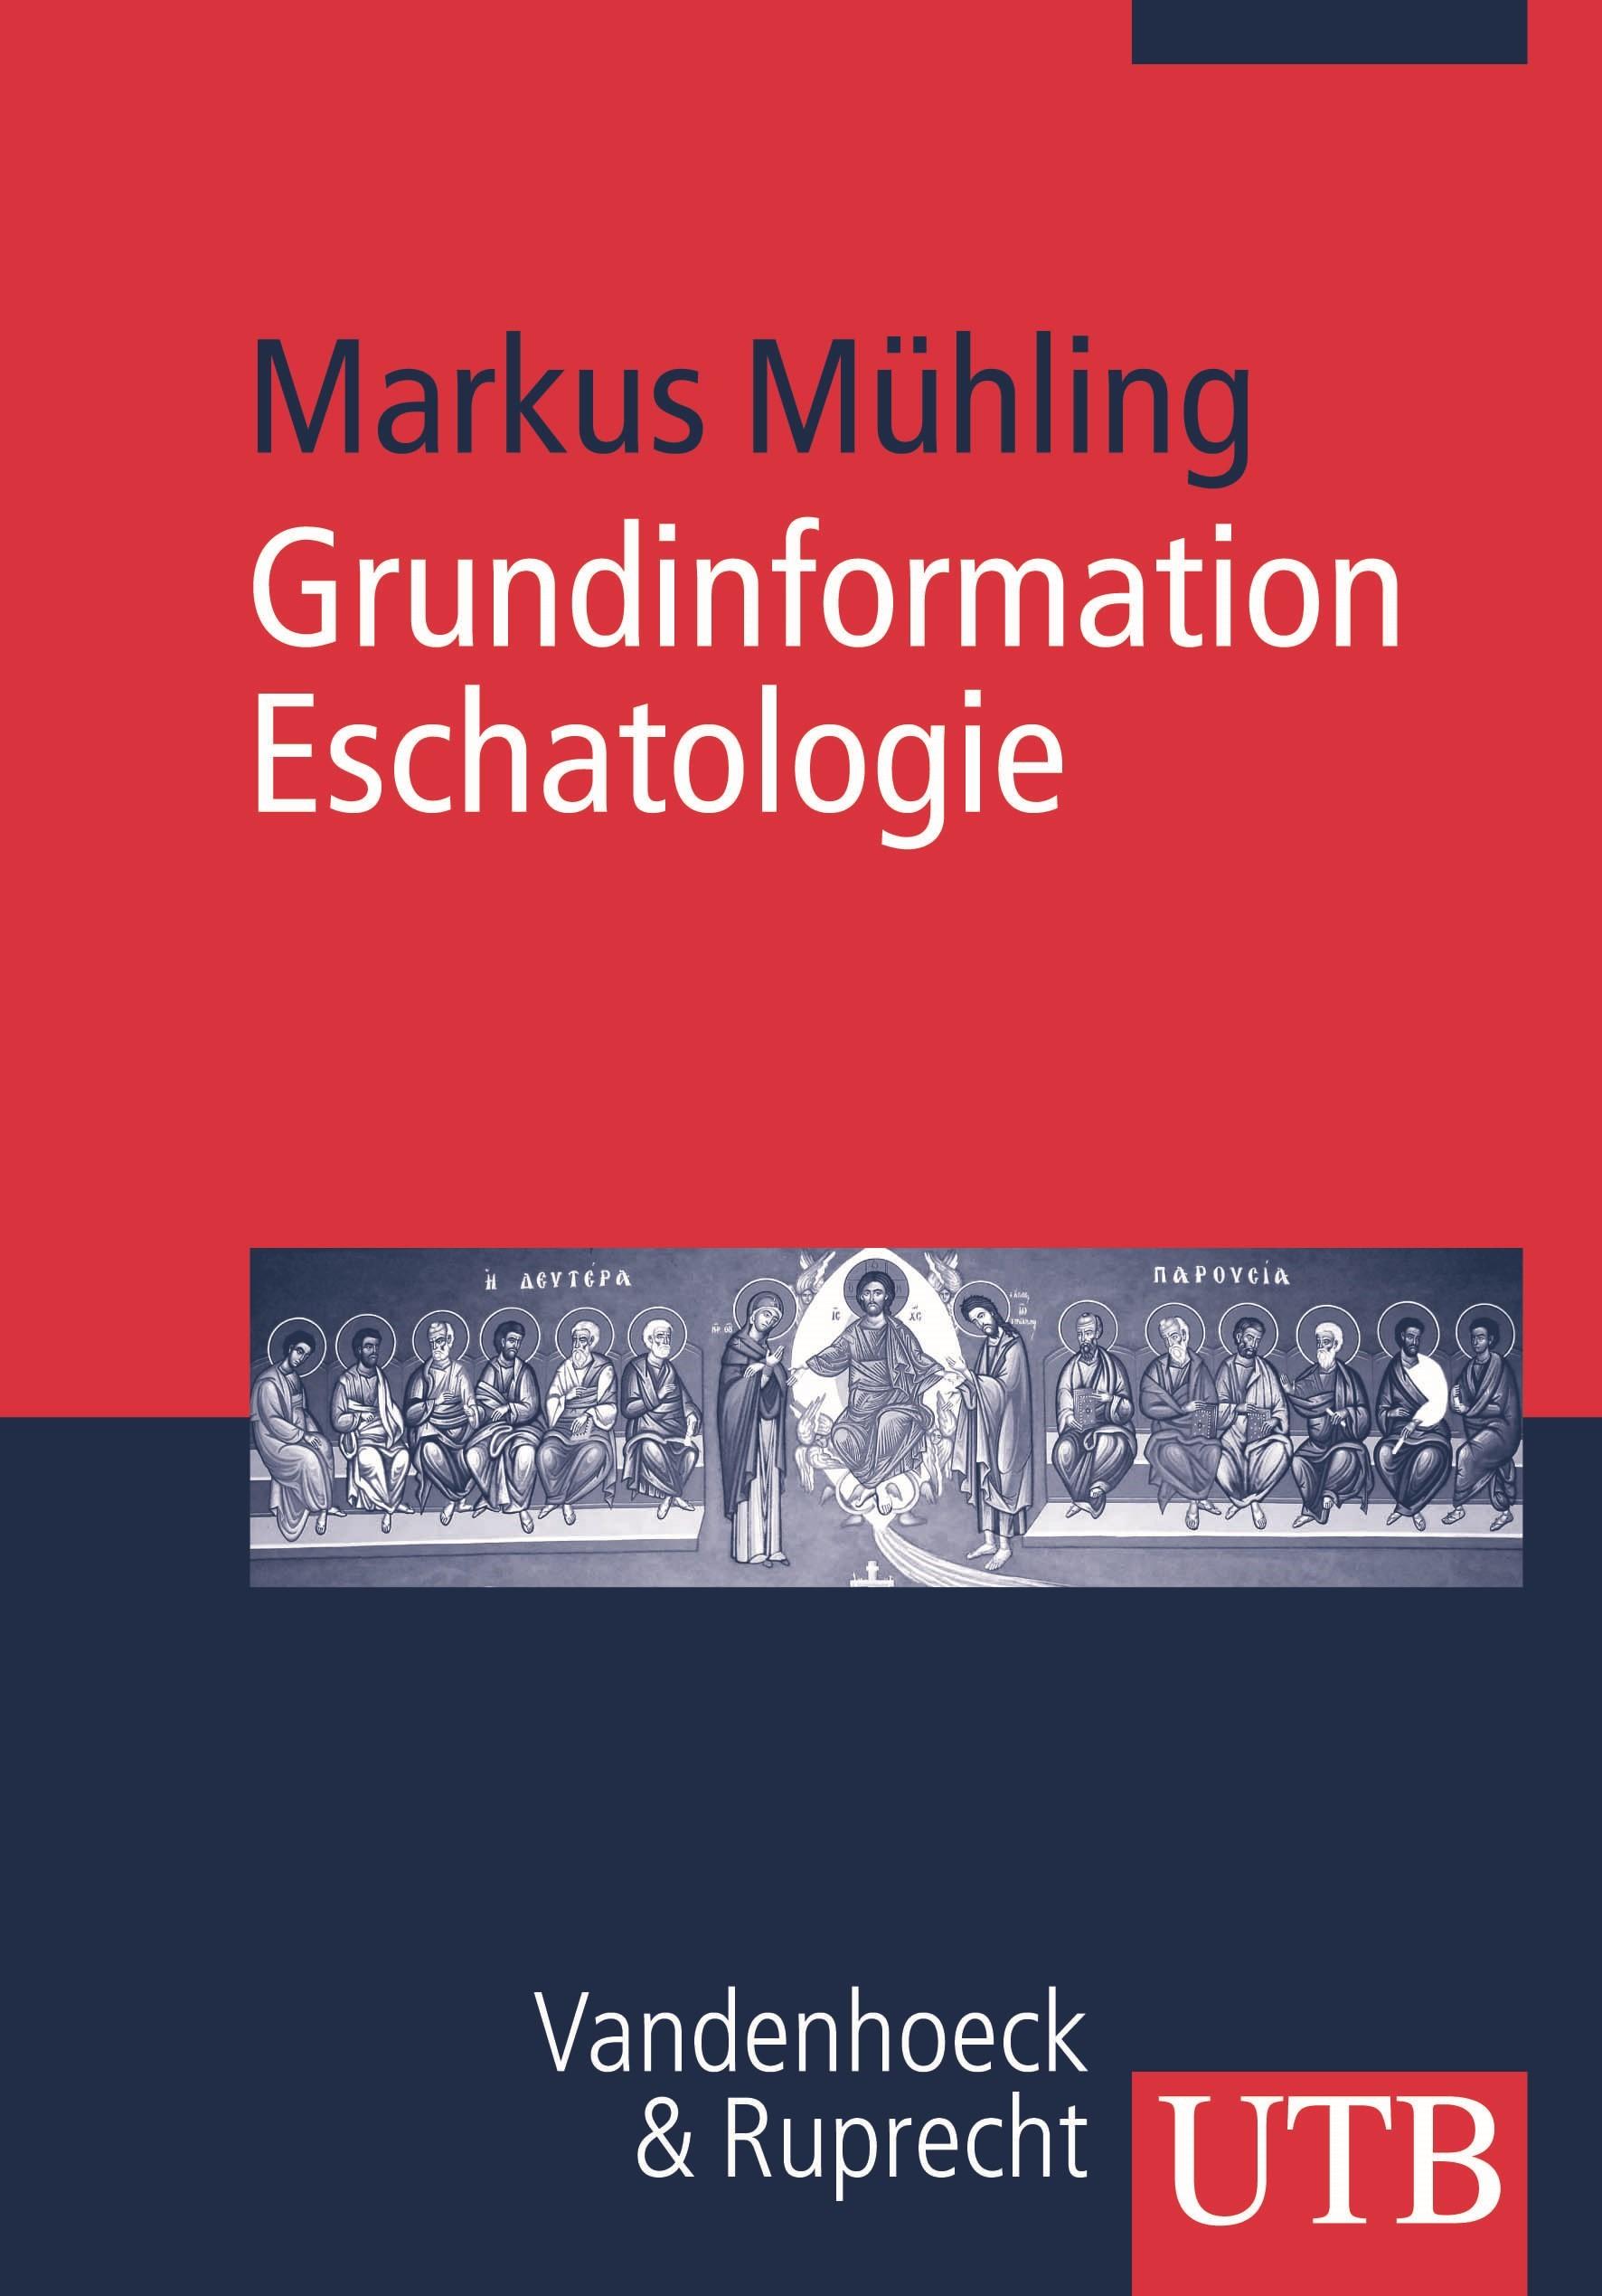 Grundinformation Eschatologie | Mühling, 2007 | Buch (Cover)